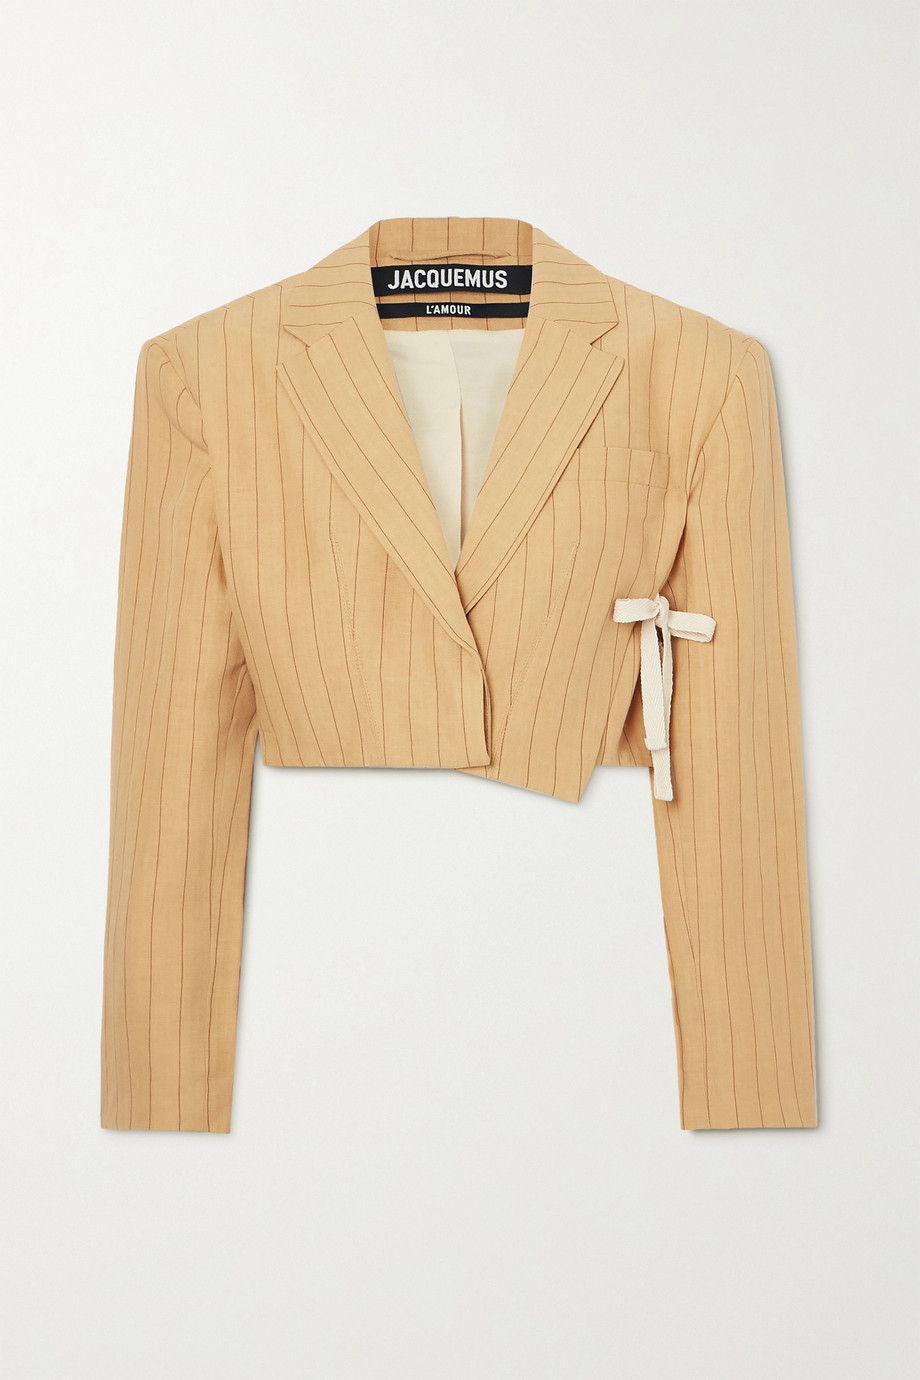 Jacquemus Santon tie-detailed pinstriped linen blazer